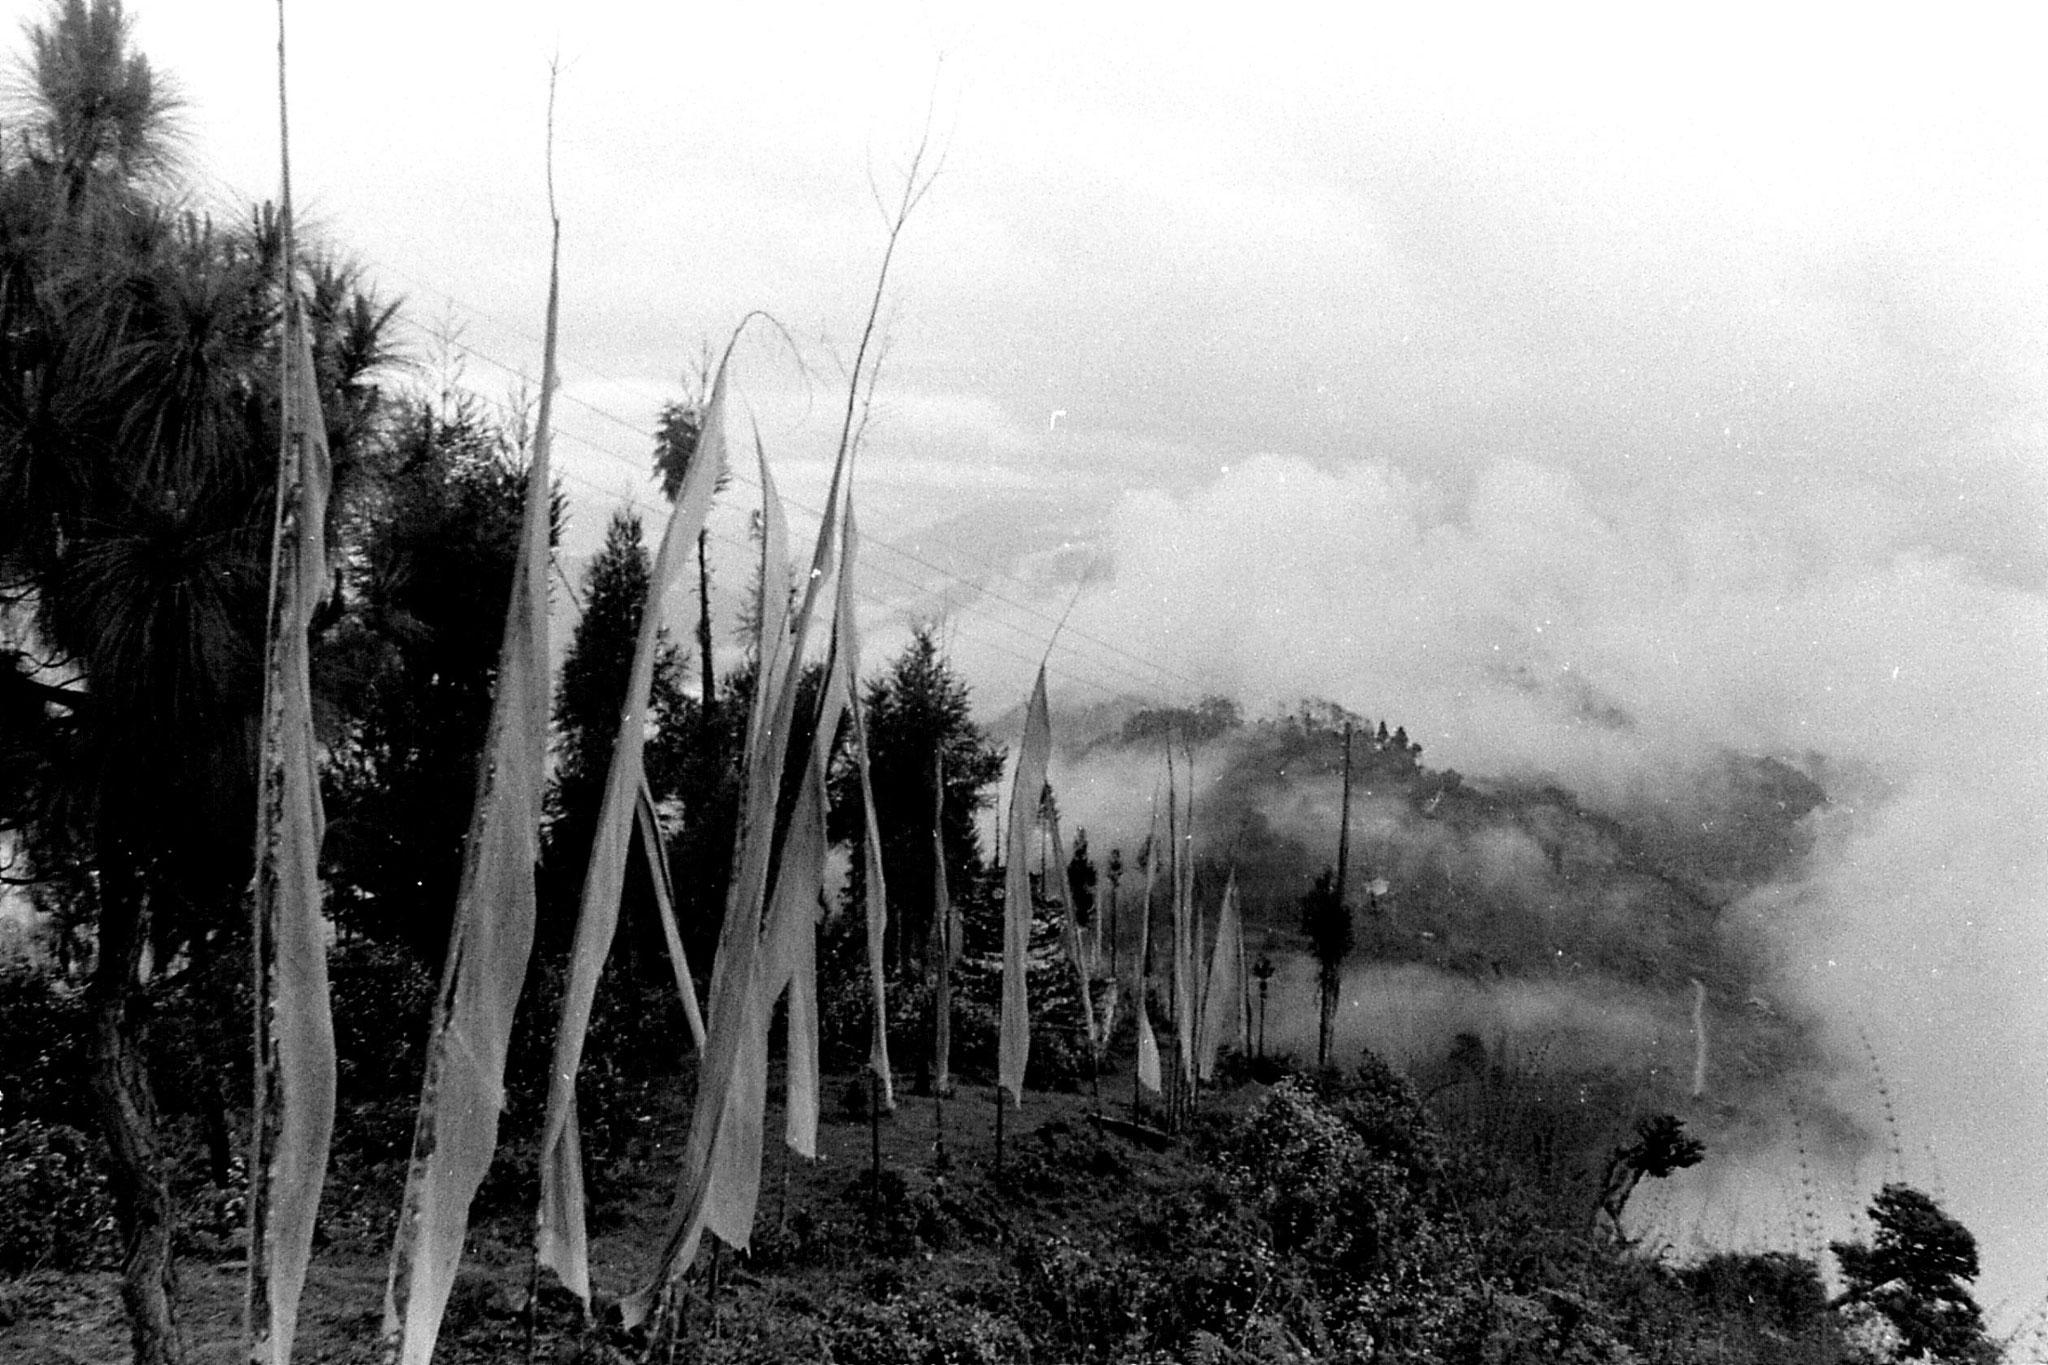 27/4/1990: 32: Pelling Sanga-Choling monastery